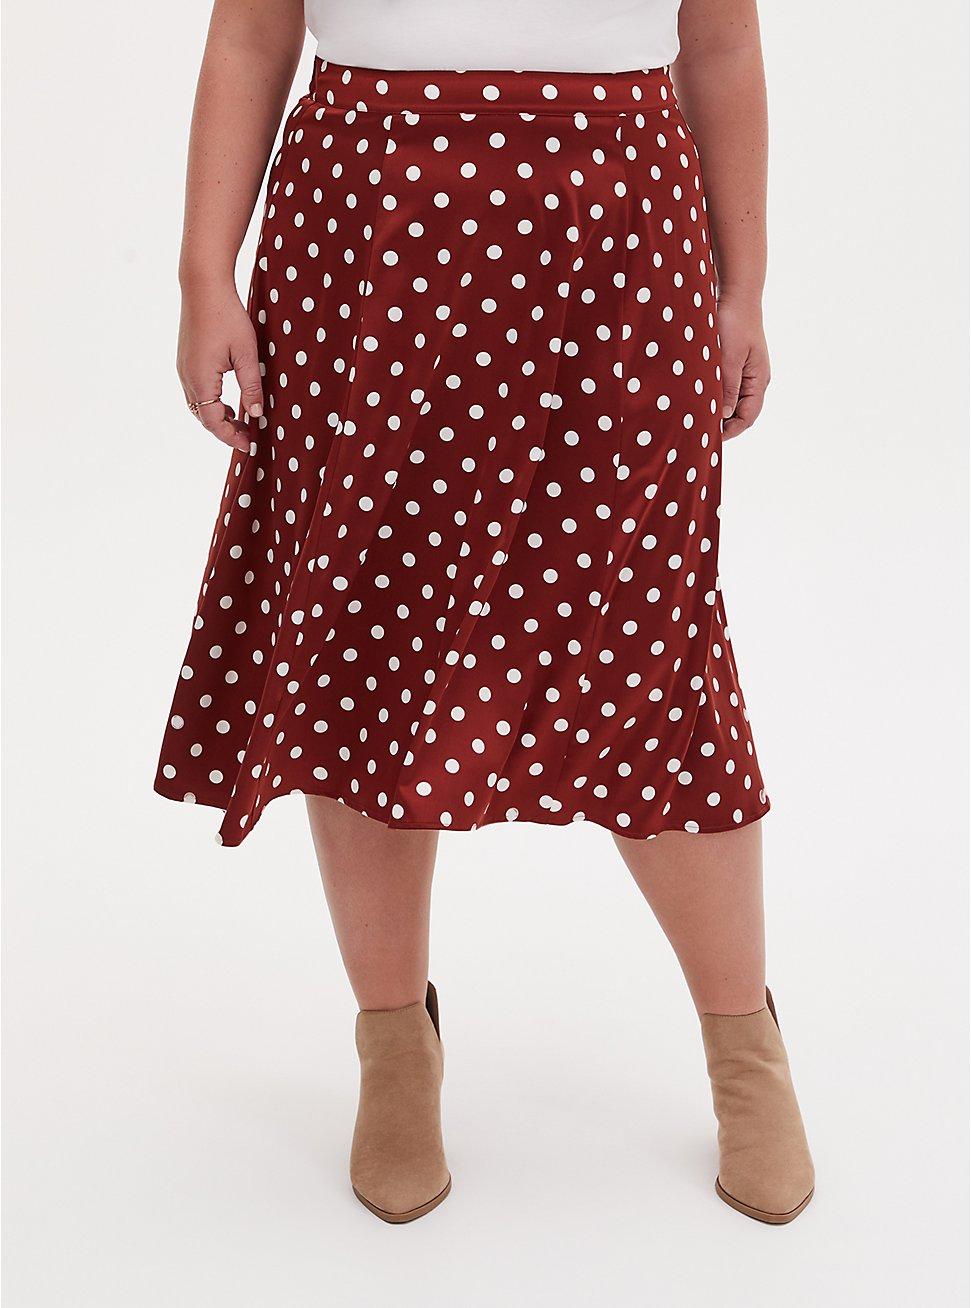 Brick Red Polka Dot Satin A-Line Midi Slip Skirt, DOTS - BROWN, hi-res